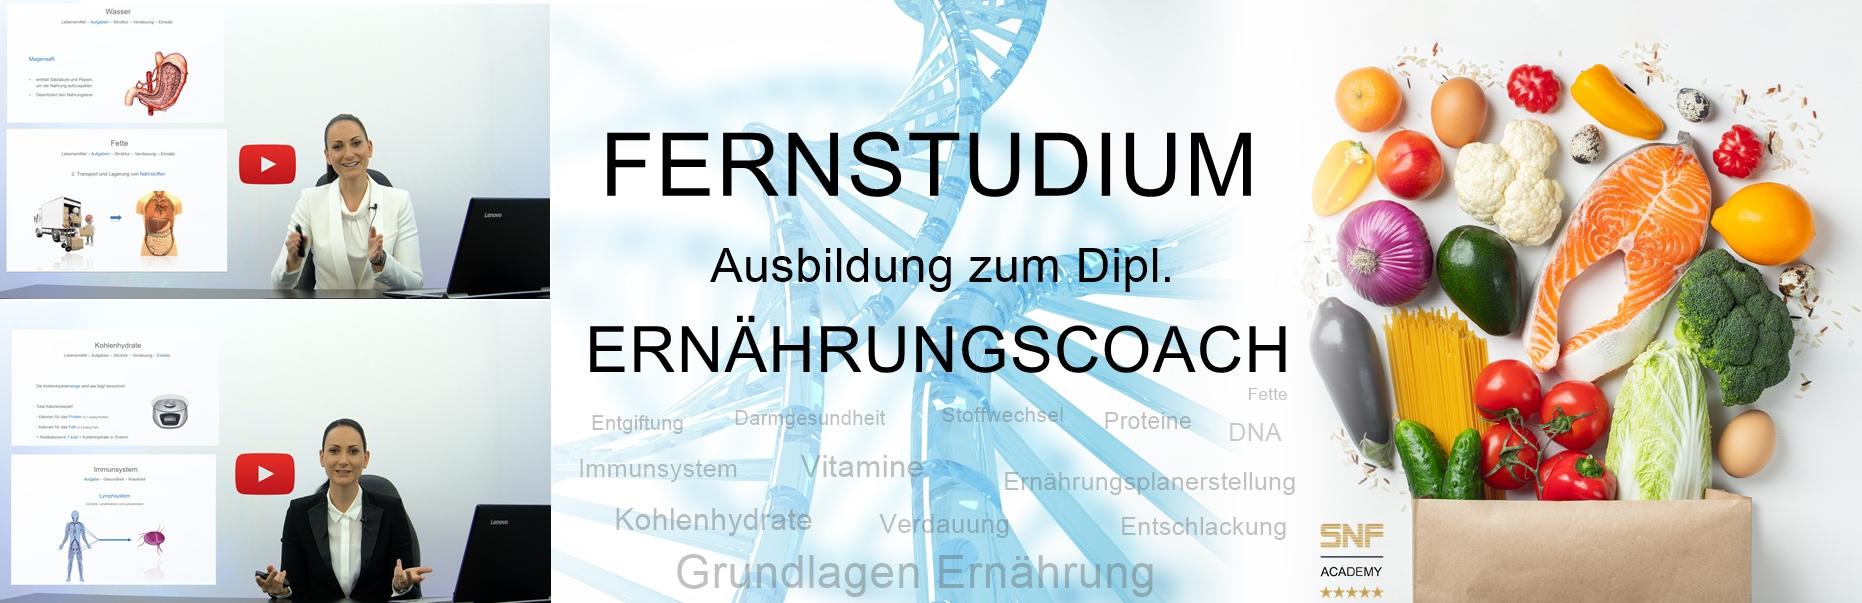 FERNSTUDIUM_ERNÄHRUNGSBERATER_AUSBILDUNG